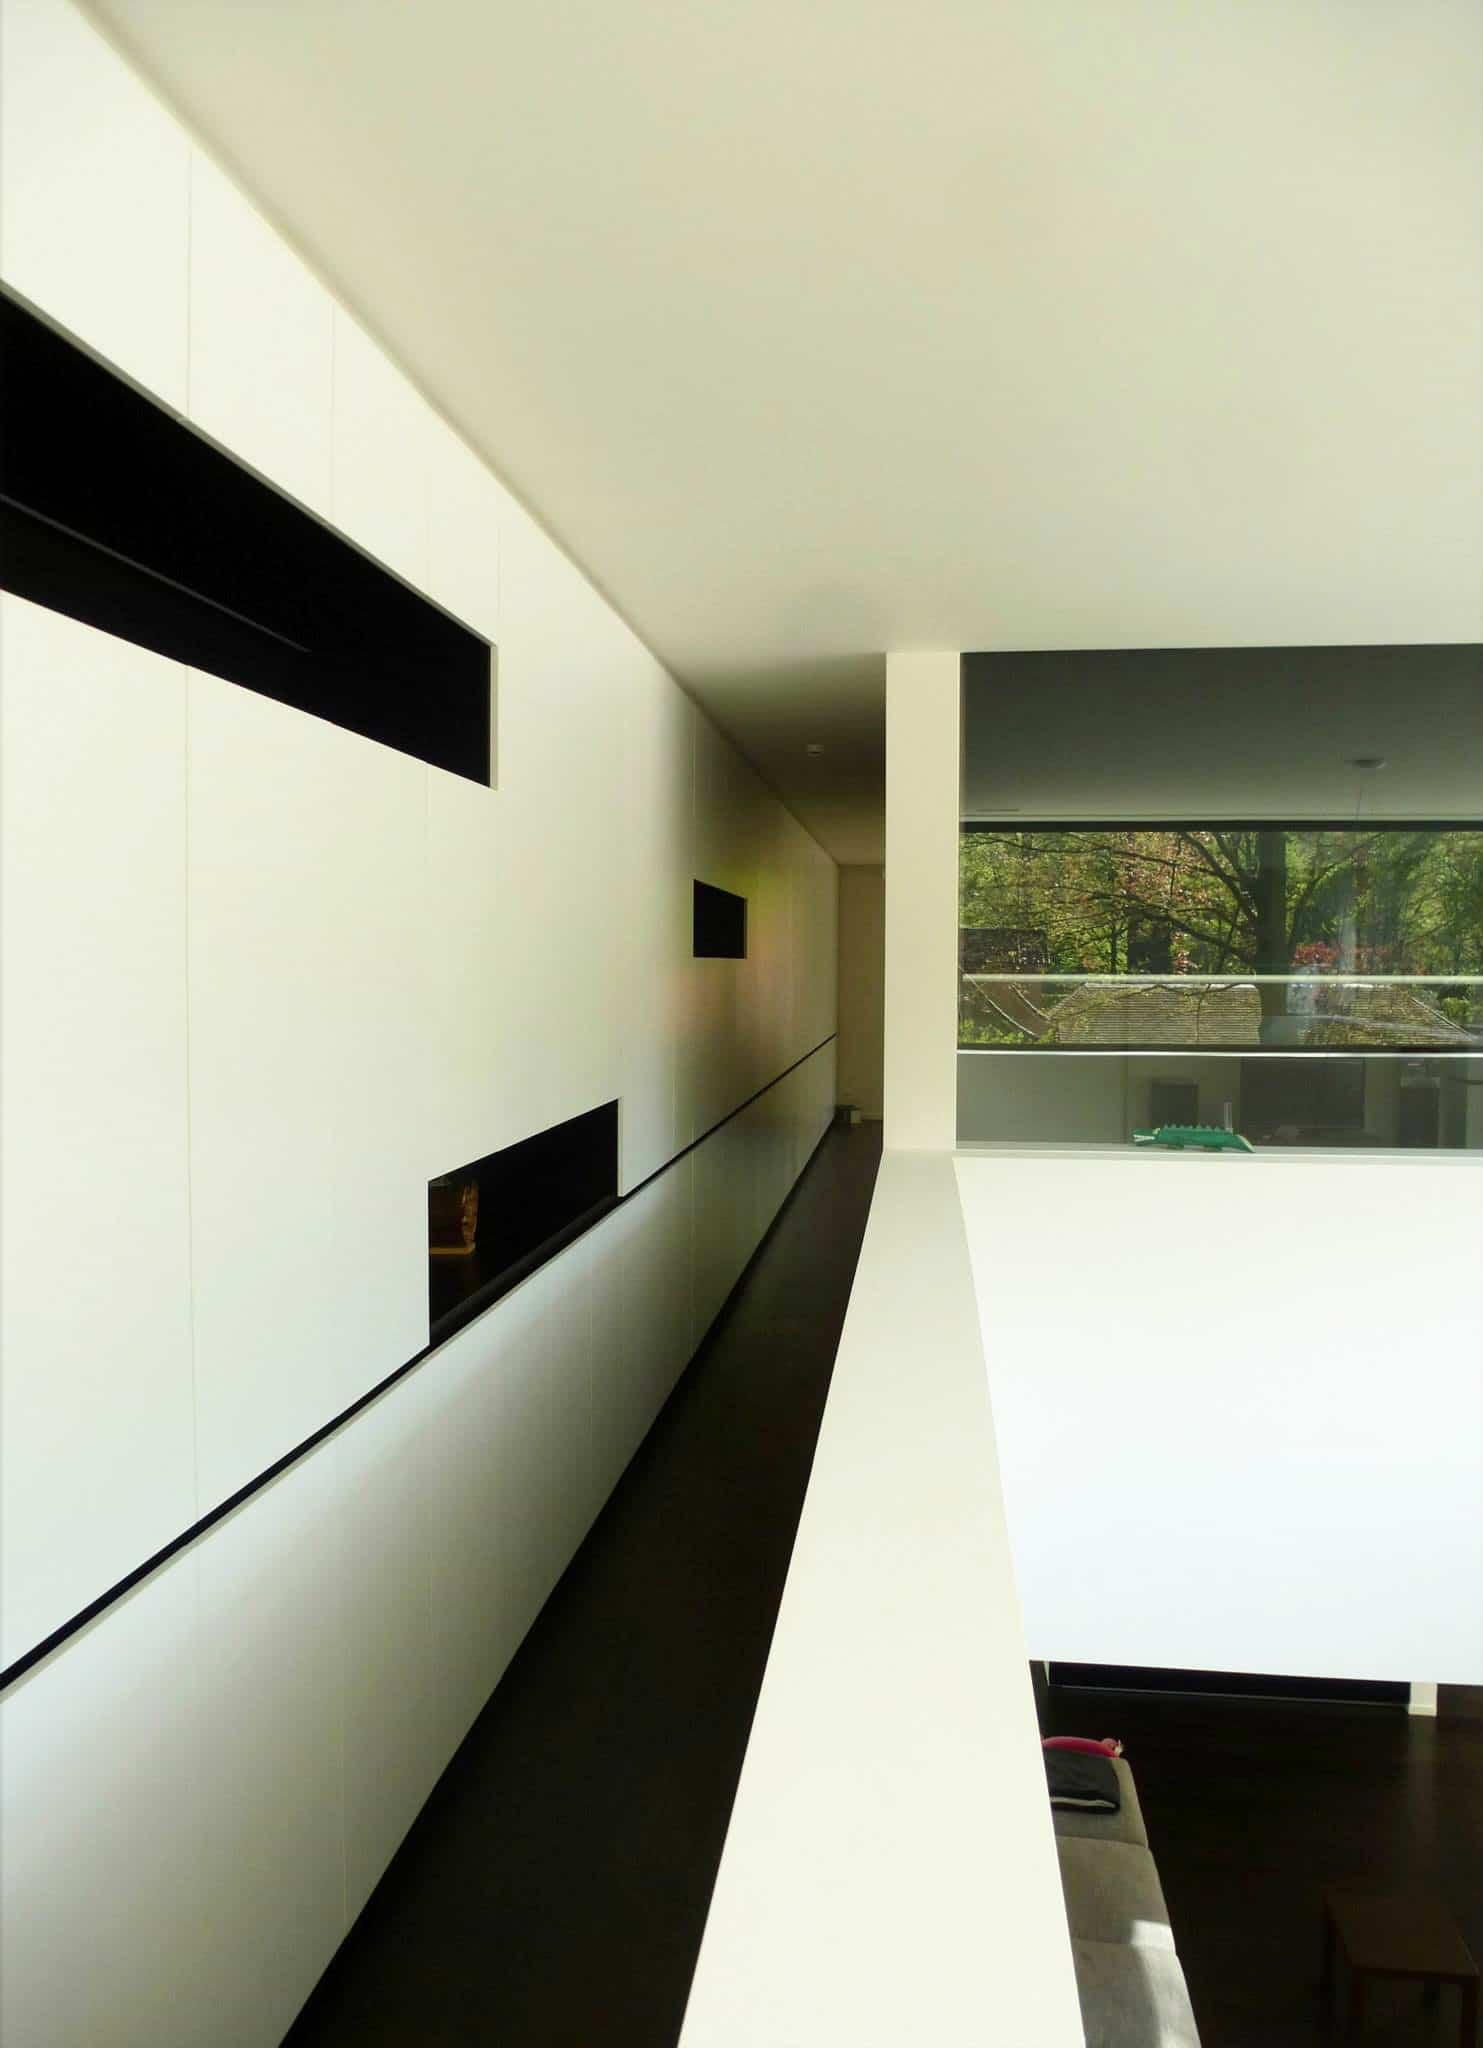 1801213 628031247274753 3399682256854531647 o | Baeyens & Beck architecten Gent | architect nieuwbouw renovatie interieur | high end | architectenbureau